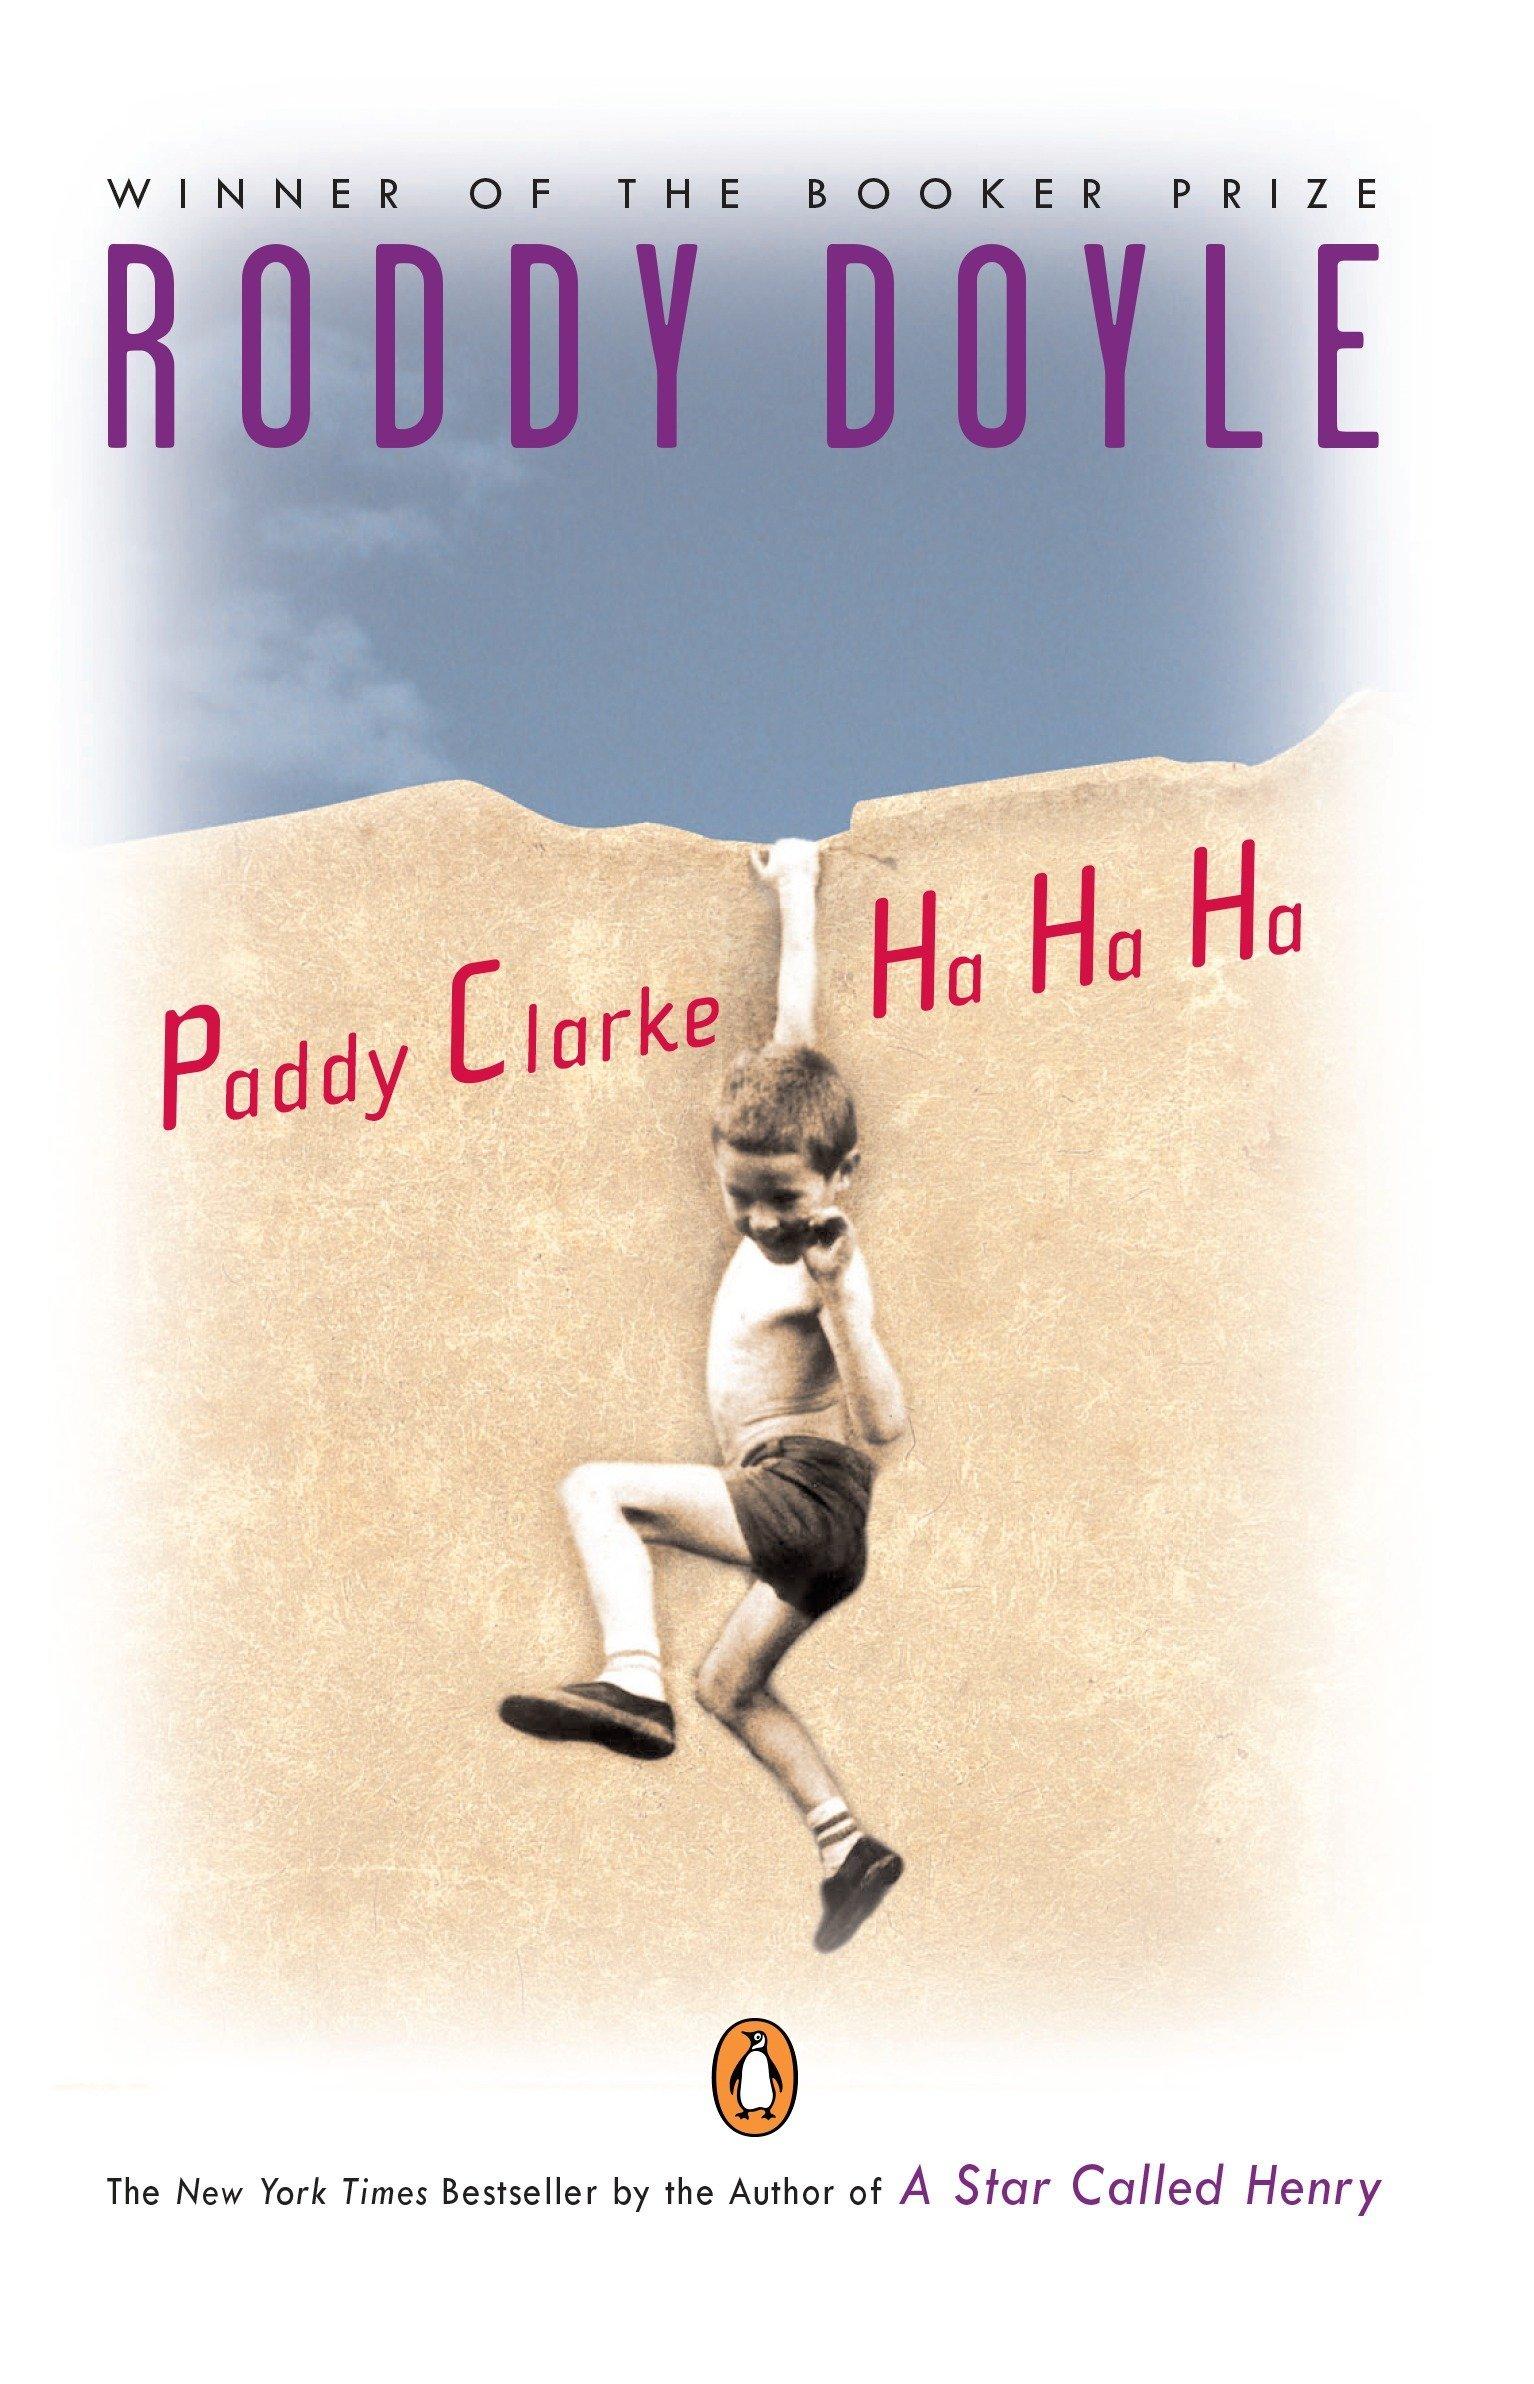 Amazon.com: Paddy Clarke Ha Ha Ha (9780140233902): Doyle, Roddy: Books